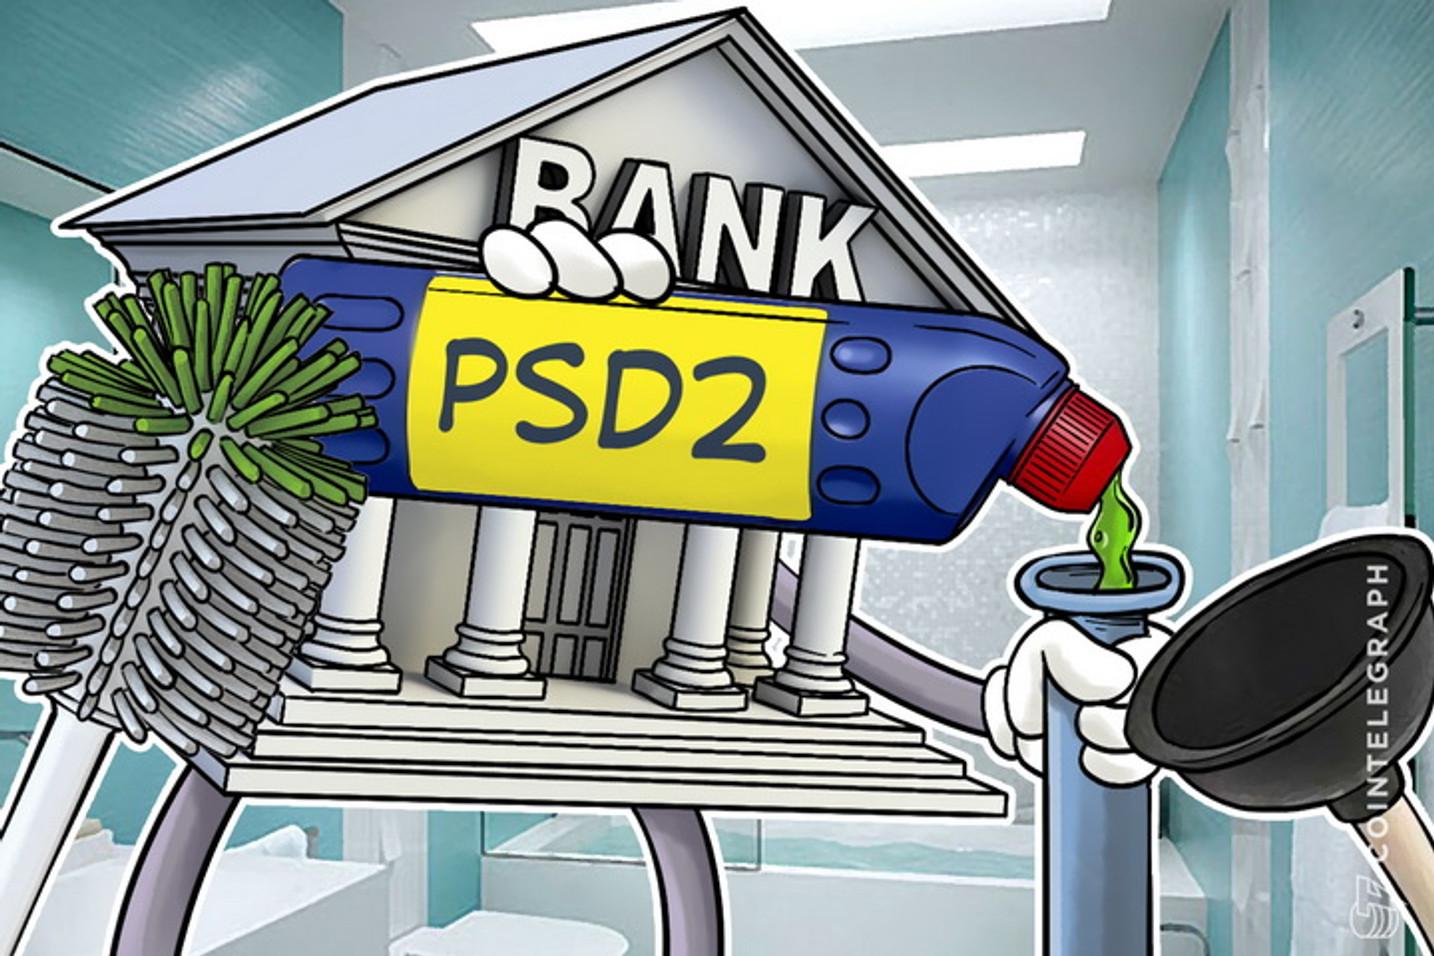 PSD2 to Accelerate Digital Revolution, Blockchain Adoption